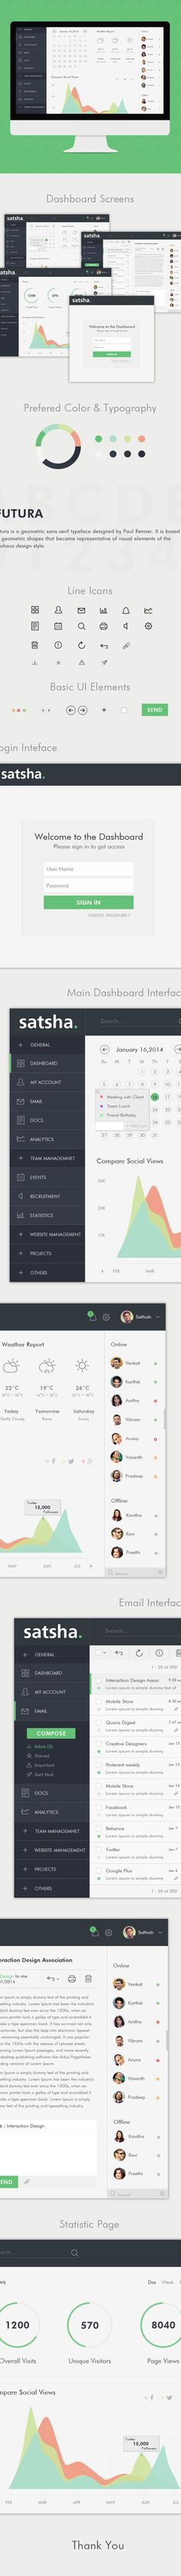 Business Admin,Web Application by Sathish G, via Behance